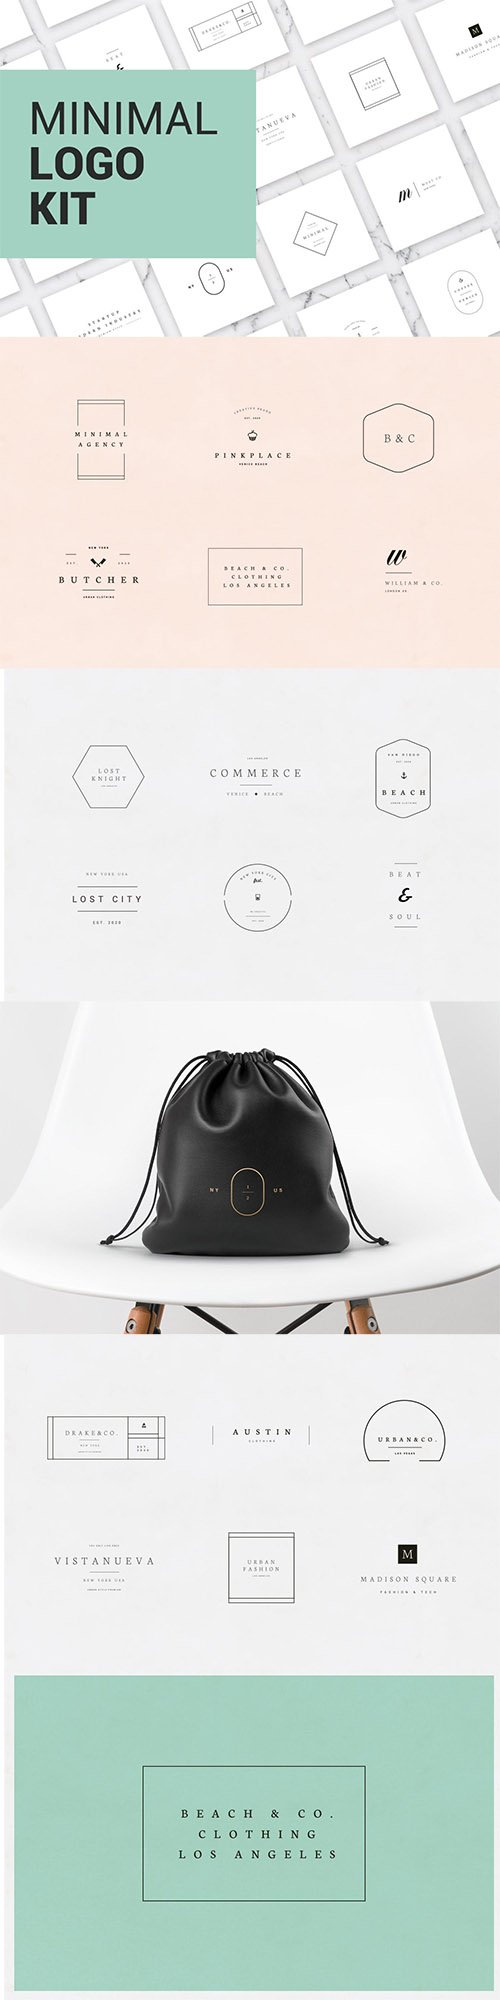 Minimal & Trendy Logo Kit